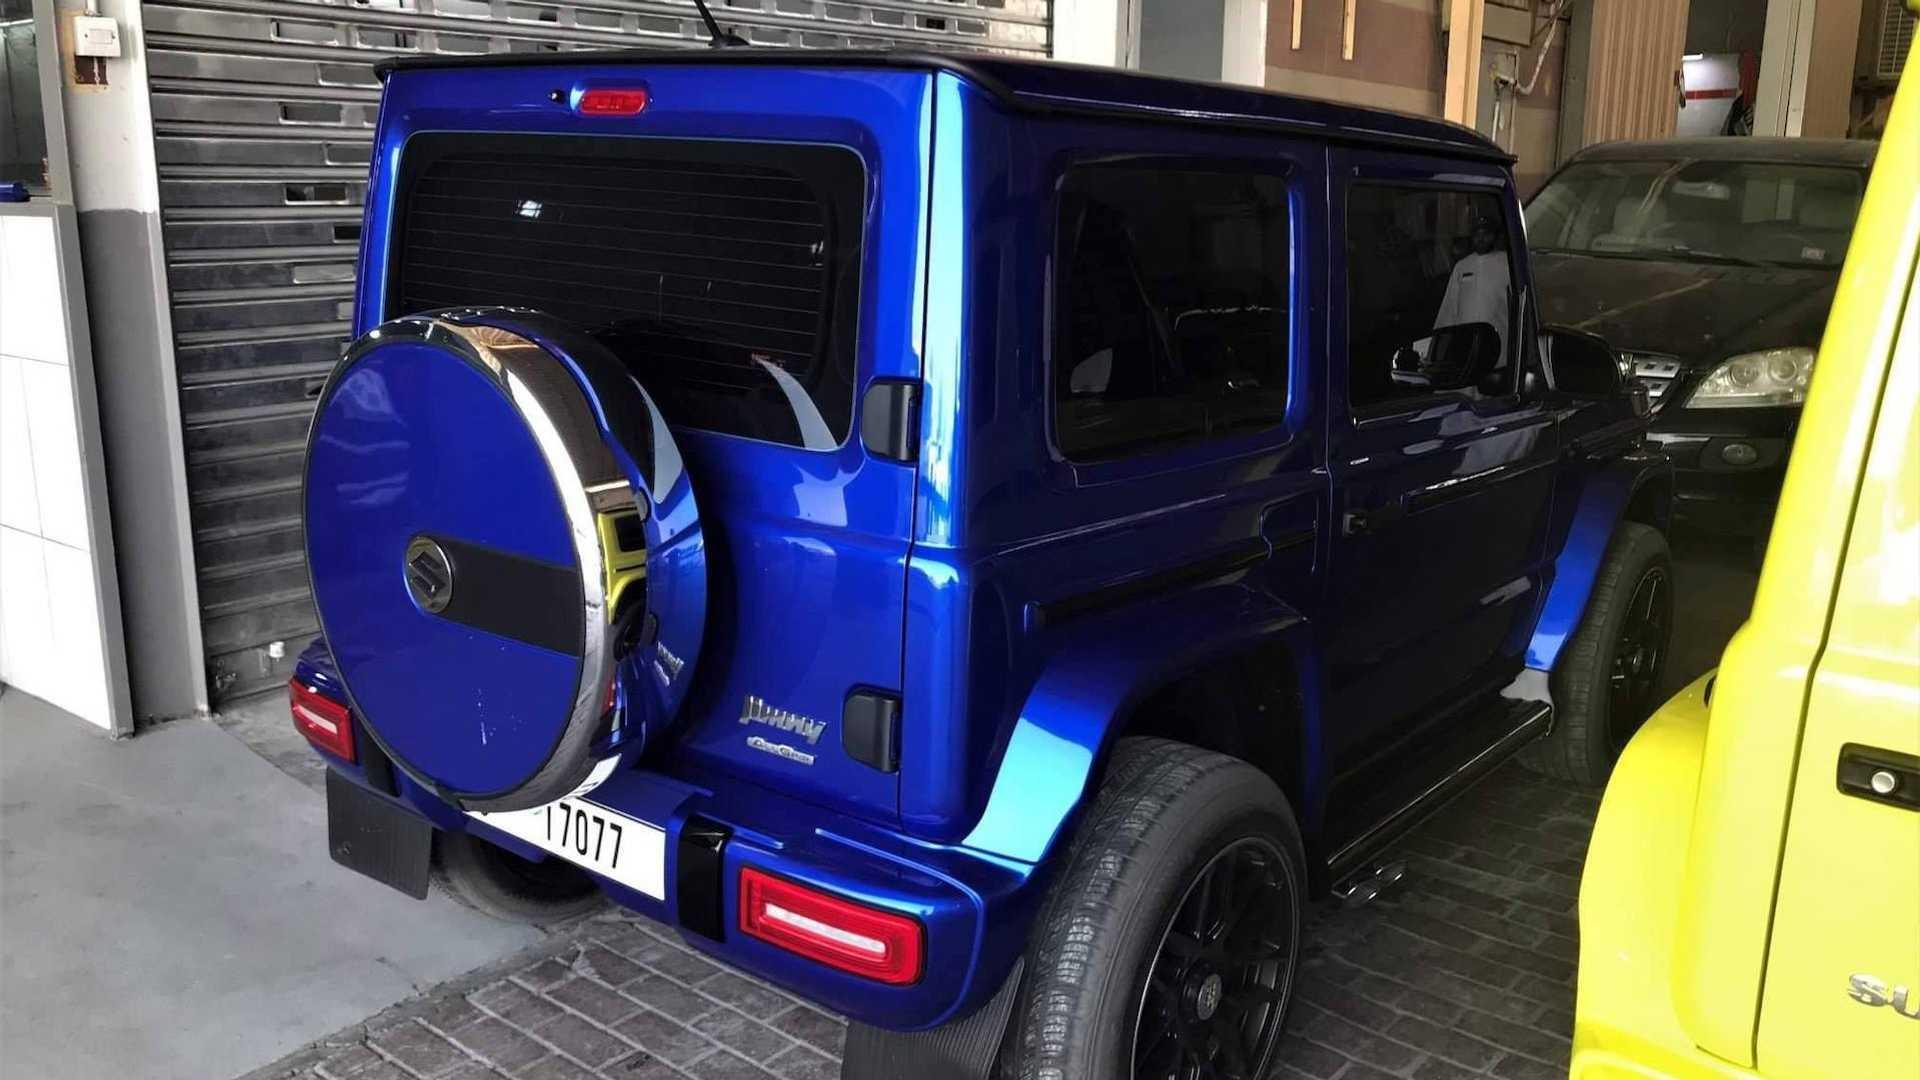 suzuki jimny gets mercedes g wagon inspired conversion kits. Black Bedroom Furniture Sets. Home Design Ideas